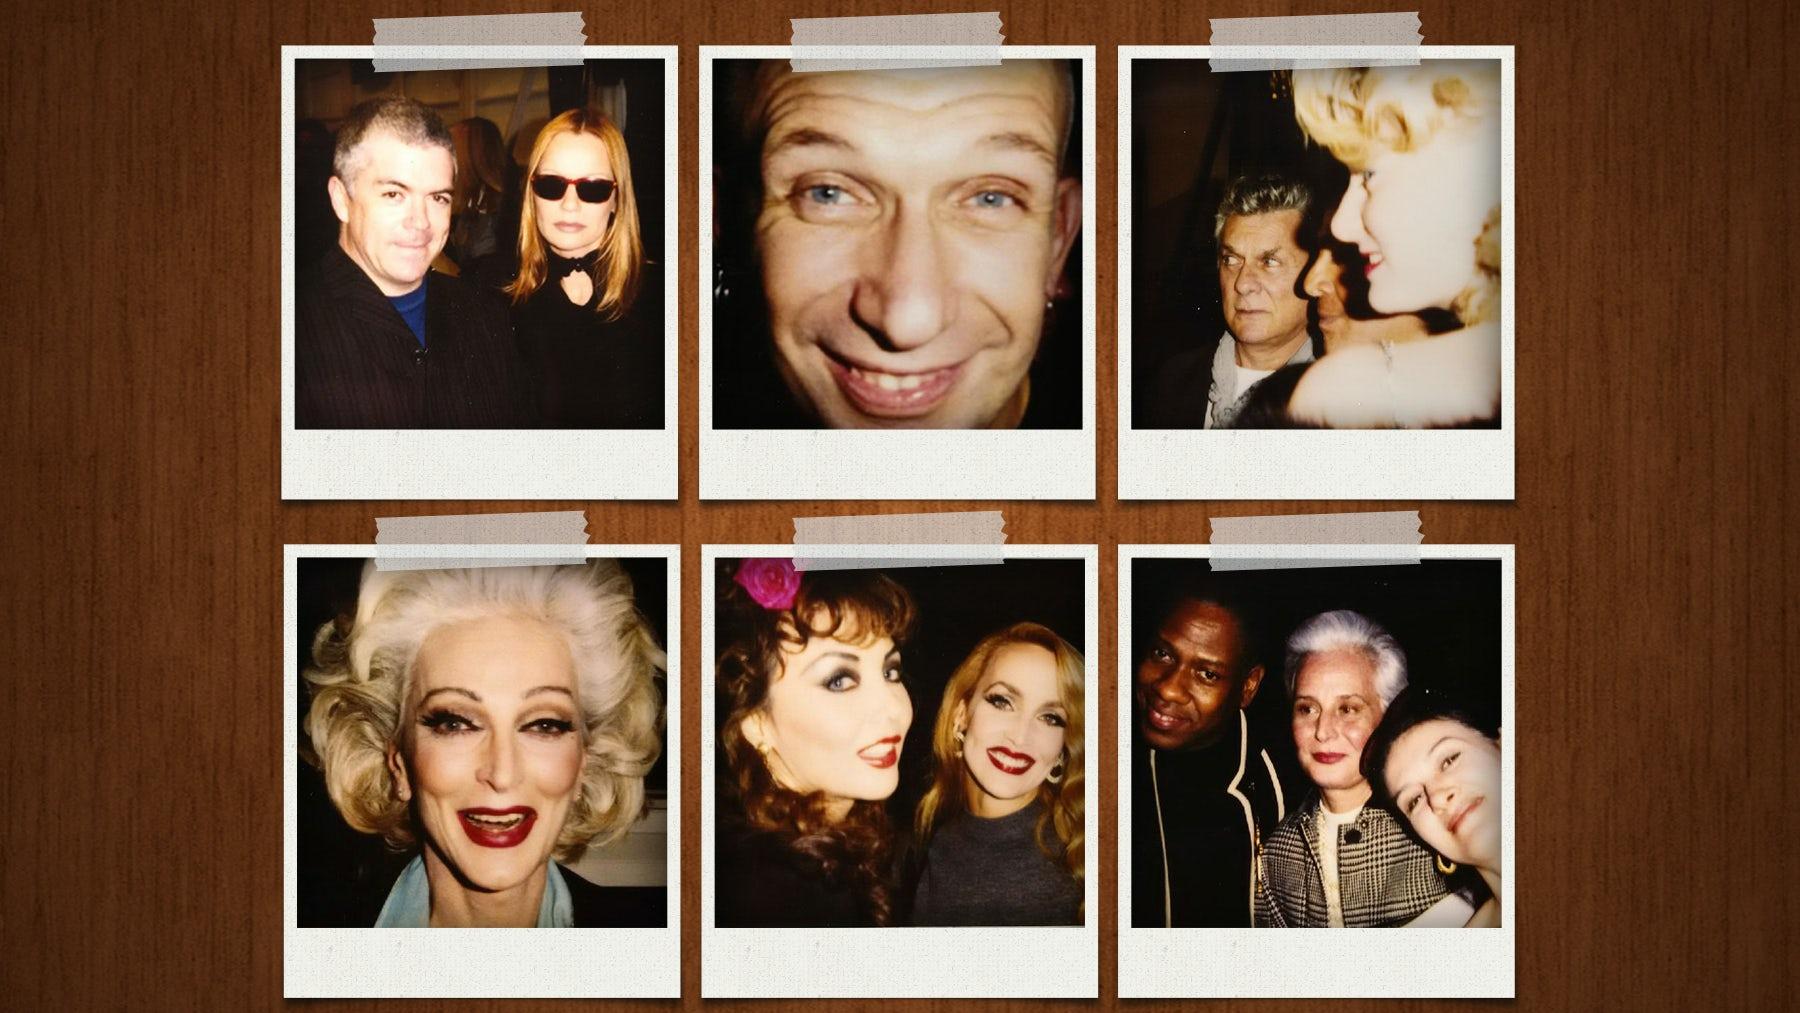 Article cover of Inside Tim Blanks' Box of '90s Polaroids